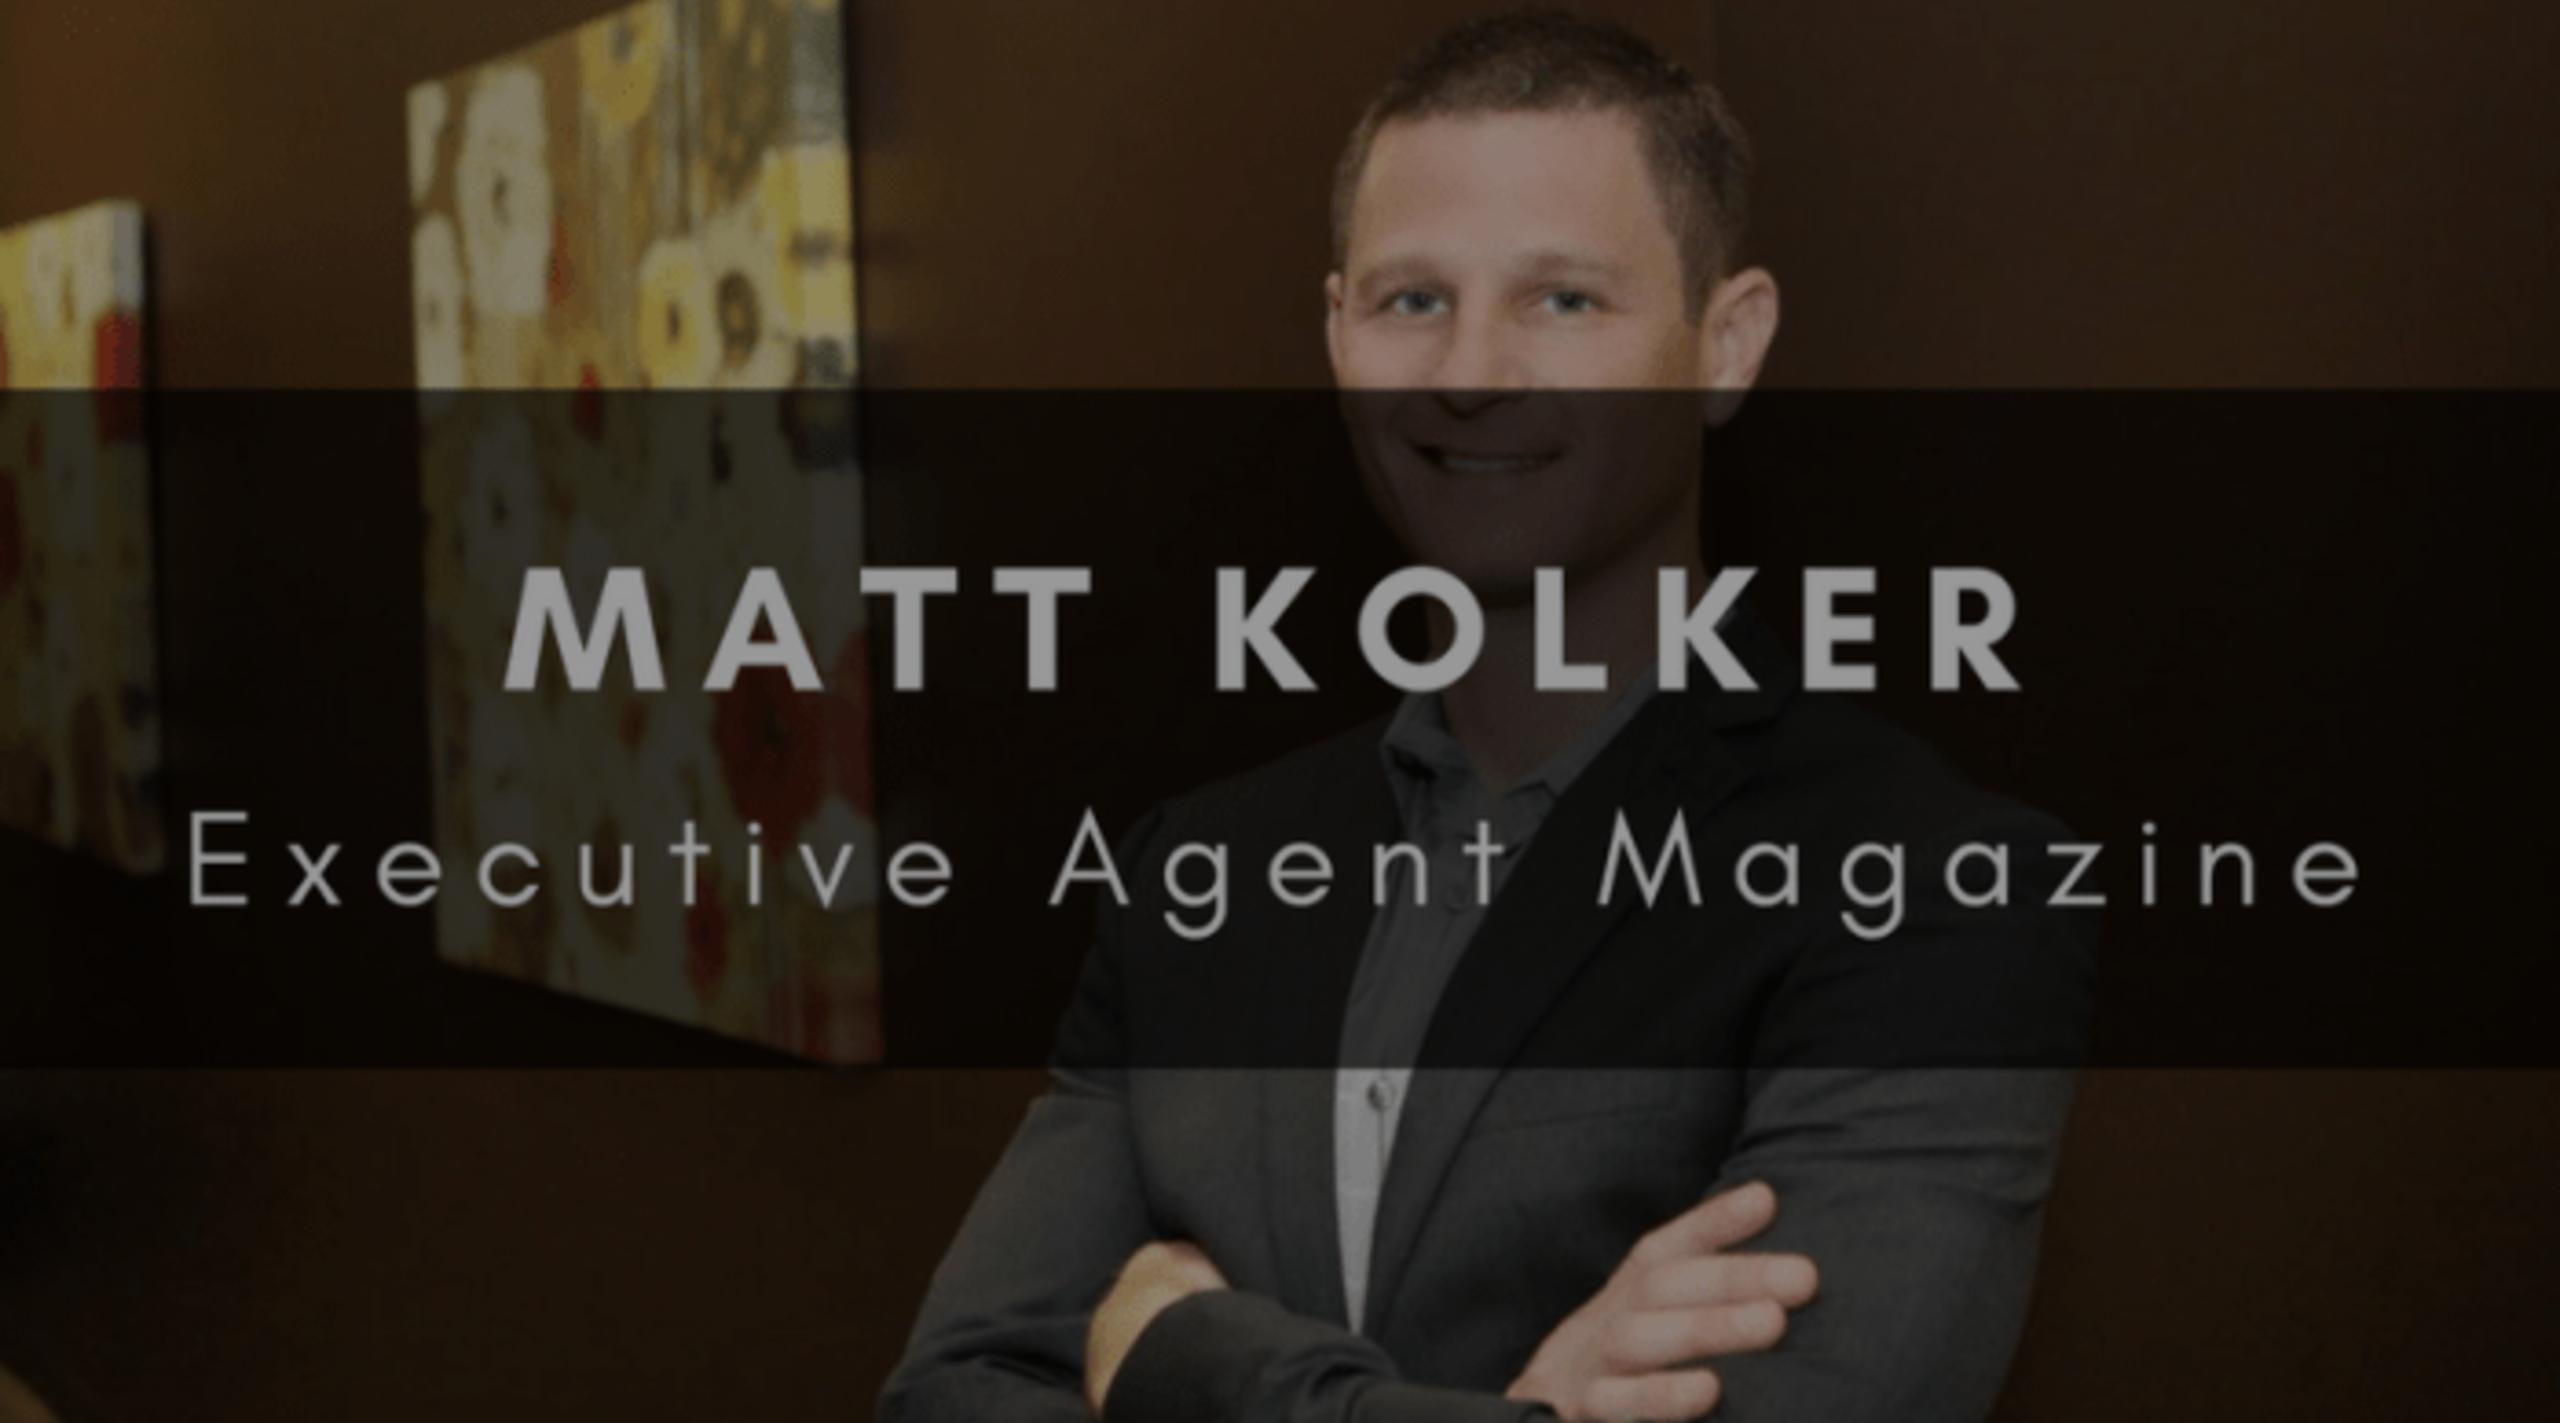 MATT KOLKER | EXECUTIVE AGENT MAGAZINE